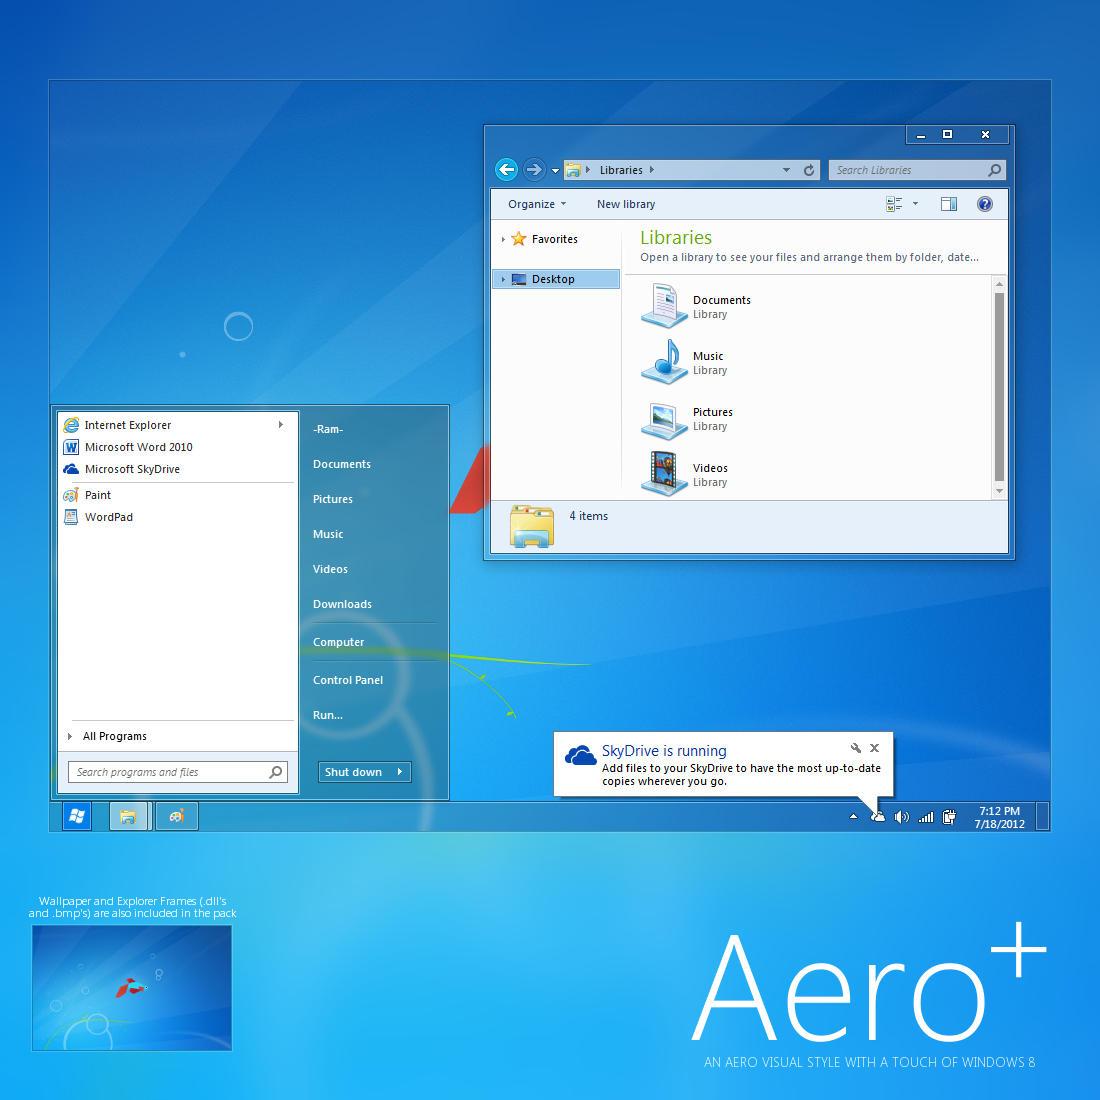 Windows Xp Theme File Software: Aero+ By Giro54 On DeviantArt